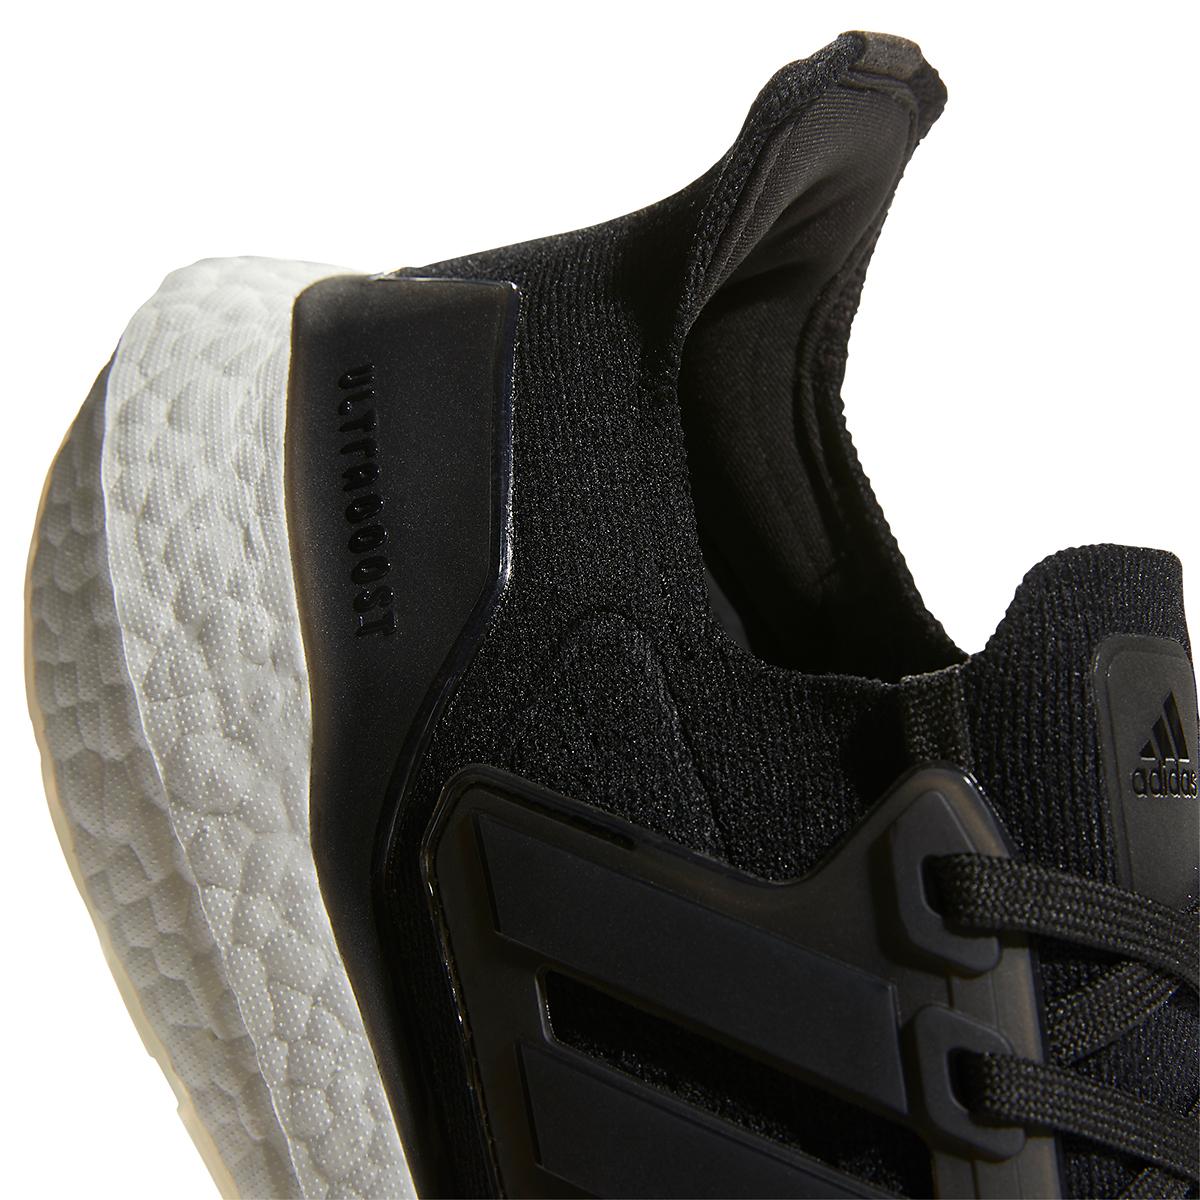 Men's Adidas Ultraboost 21 Running Shoe - Color: Core Black/Grey - Size: 6 - Width: Regular, Core Black/Grey, large, image 5